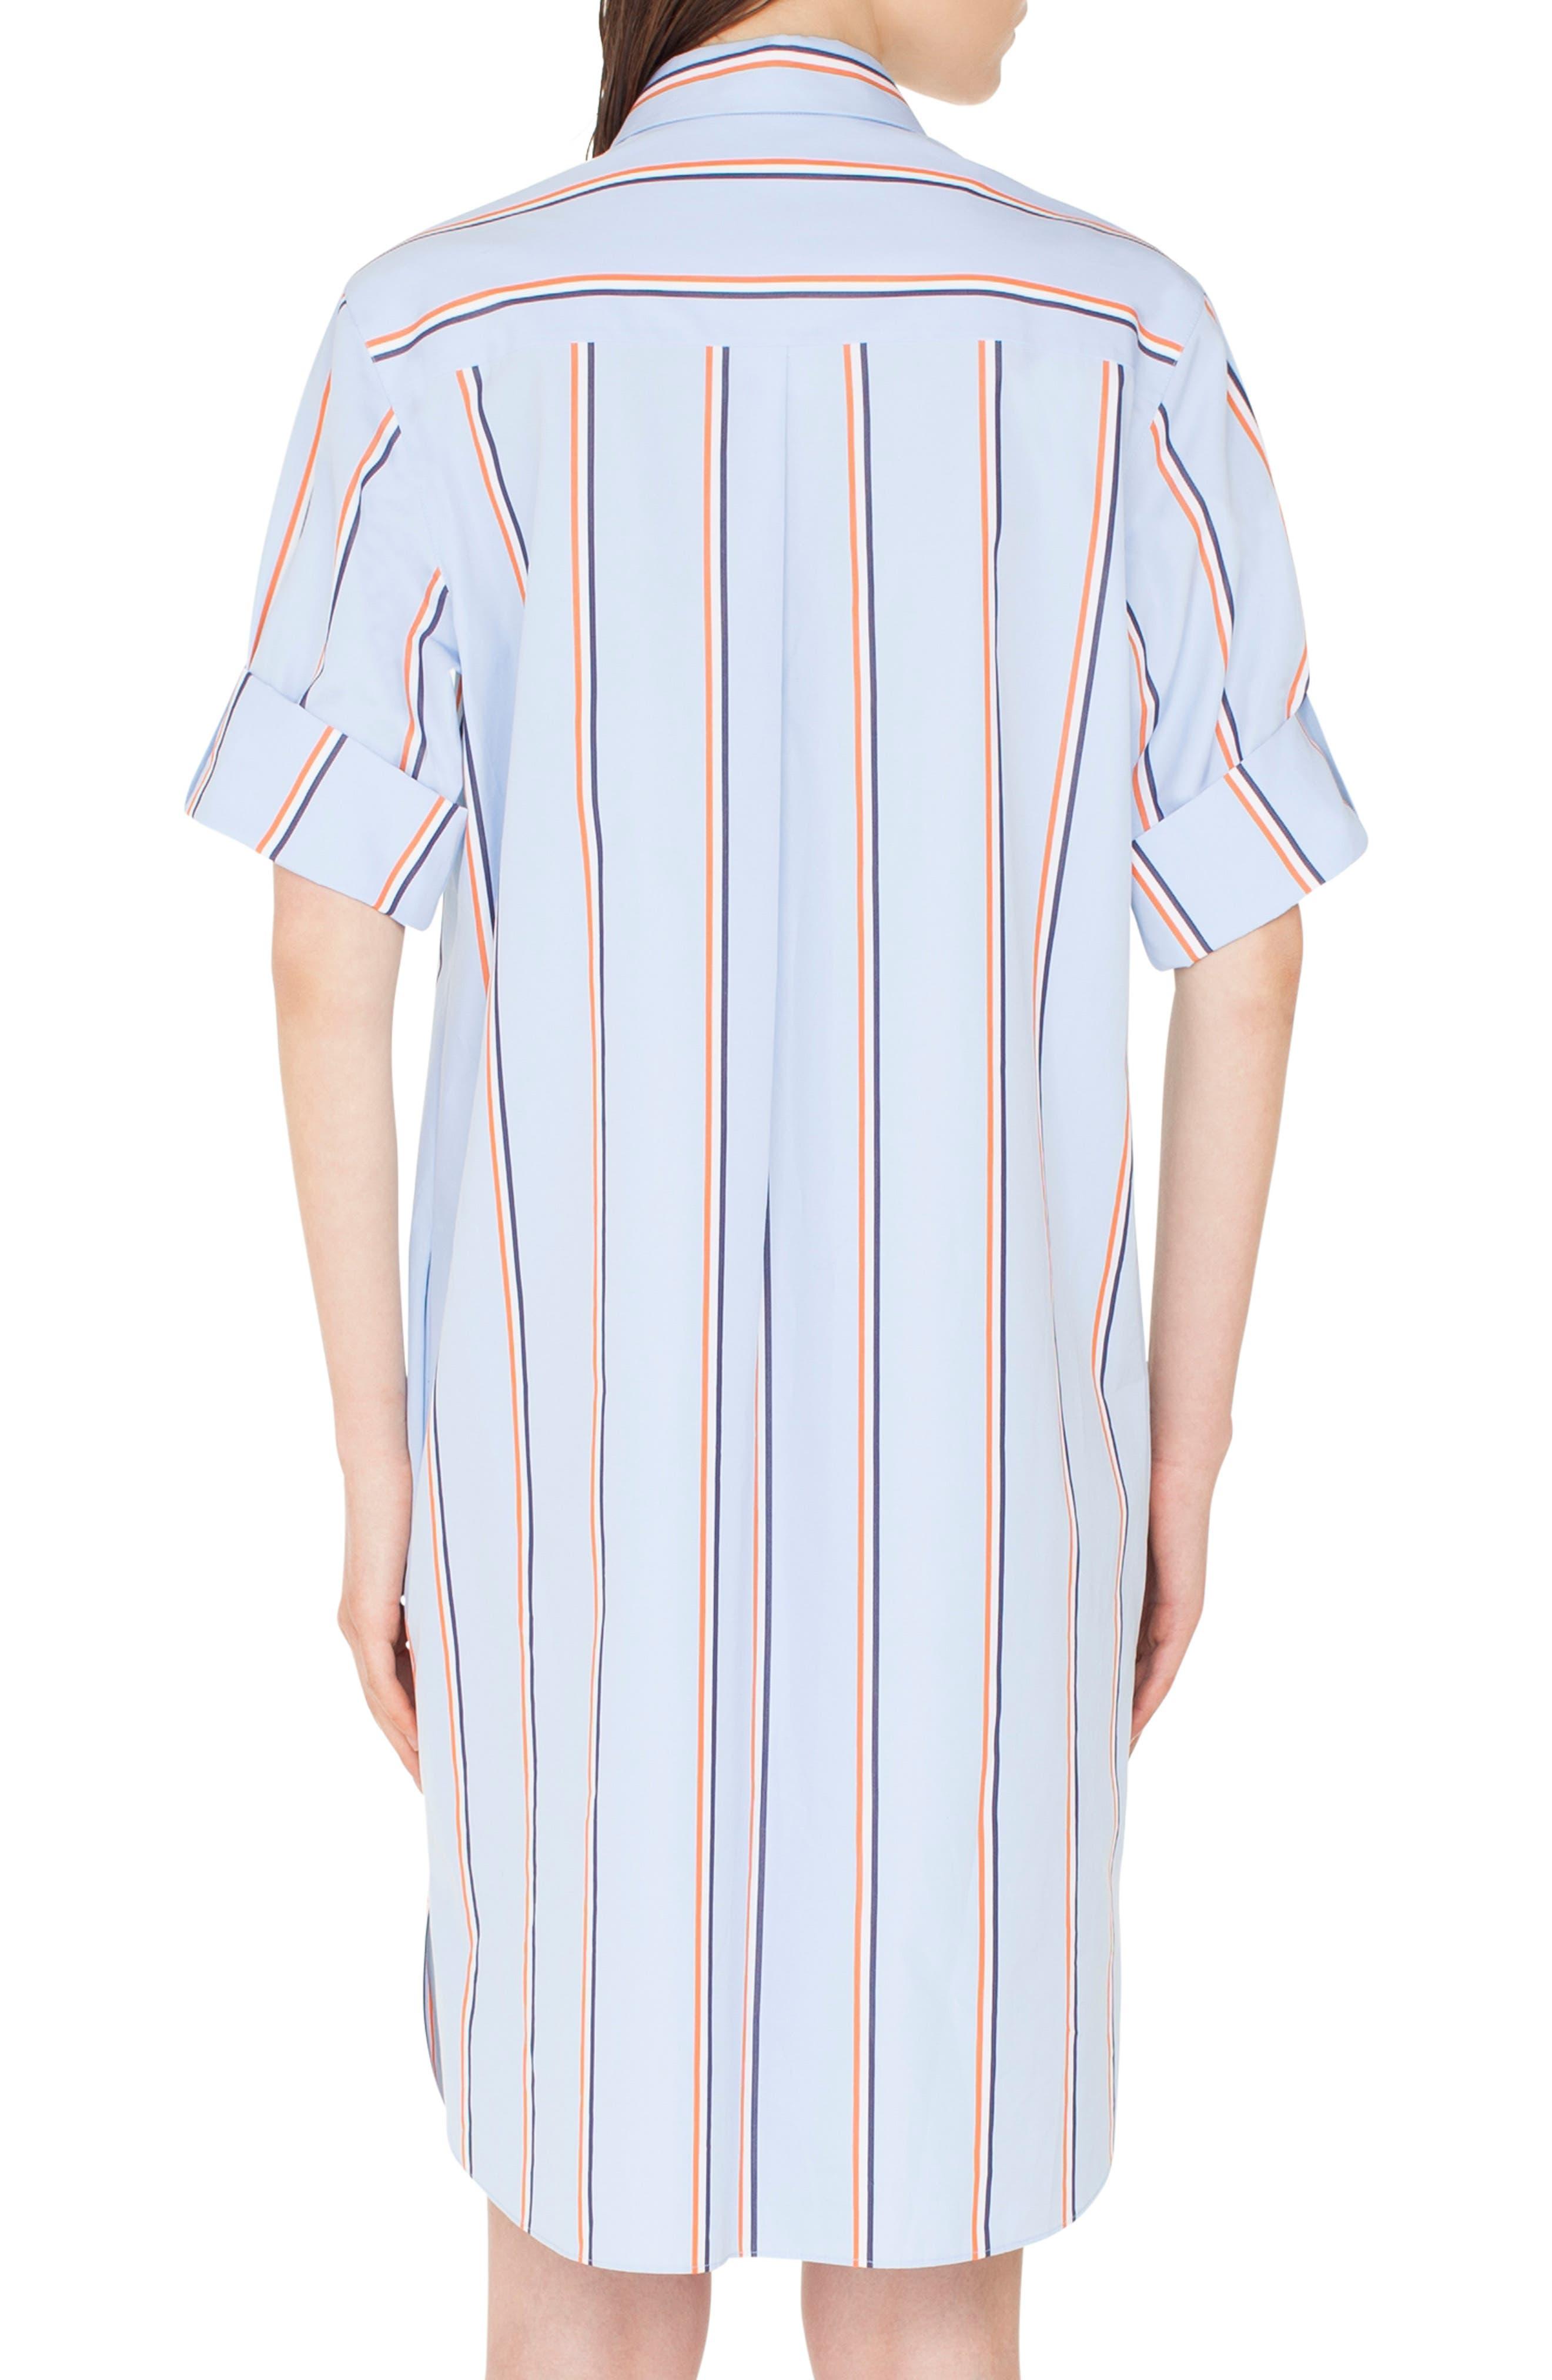 Stripe Cotton Shirtdress,                             Alternate thumbnail 2, color,                             CIELO-MULTICOLOR